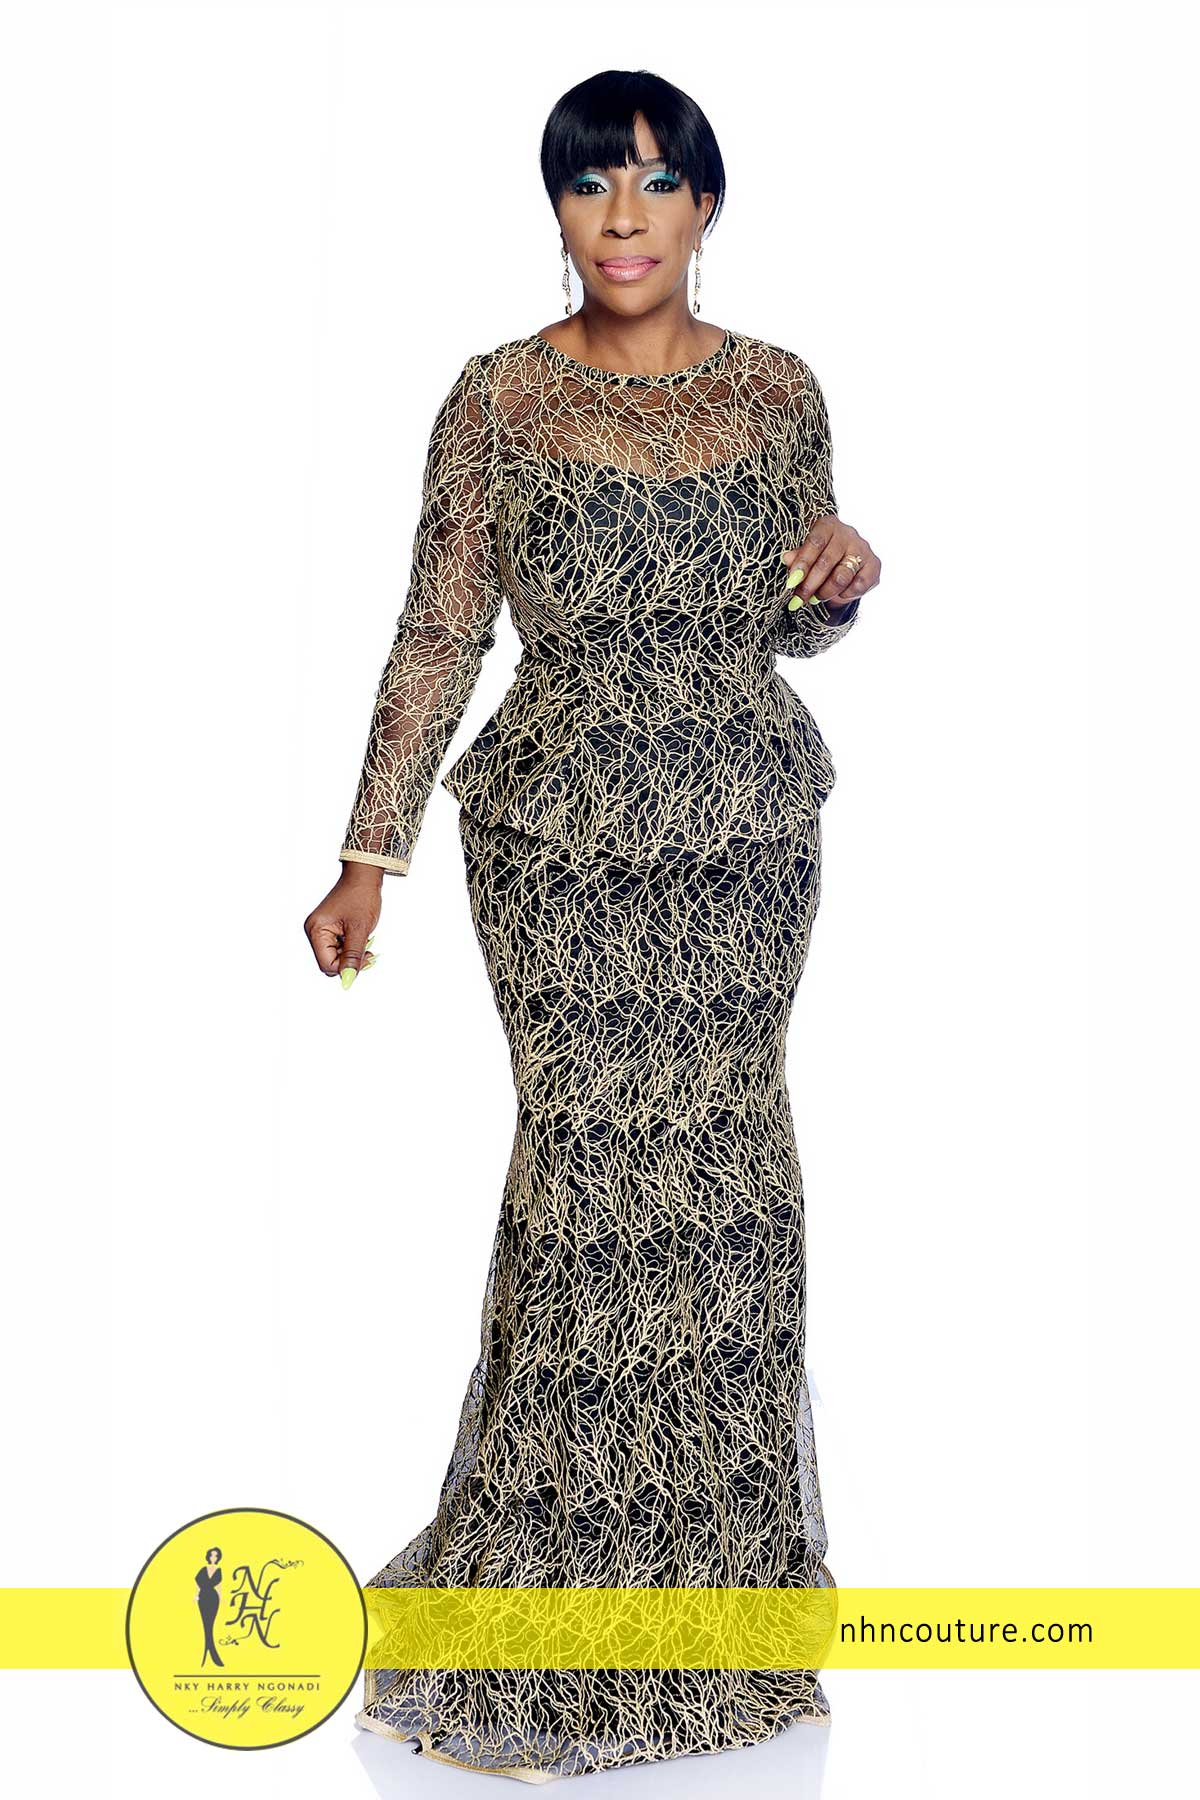 NHN Couture- Fouad Sarkis Couture-Nkechi Harry Ngonadi-1